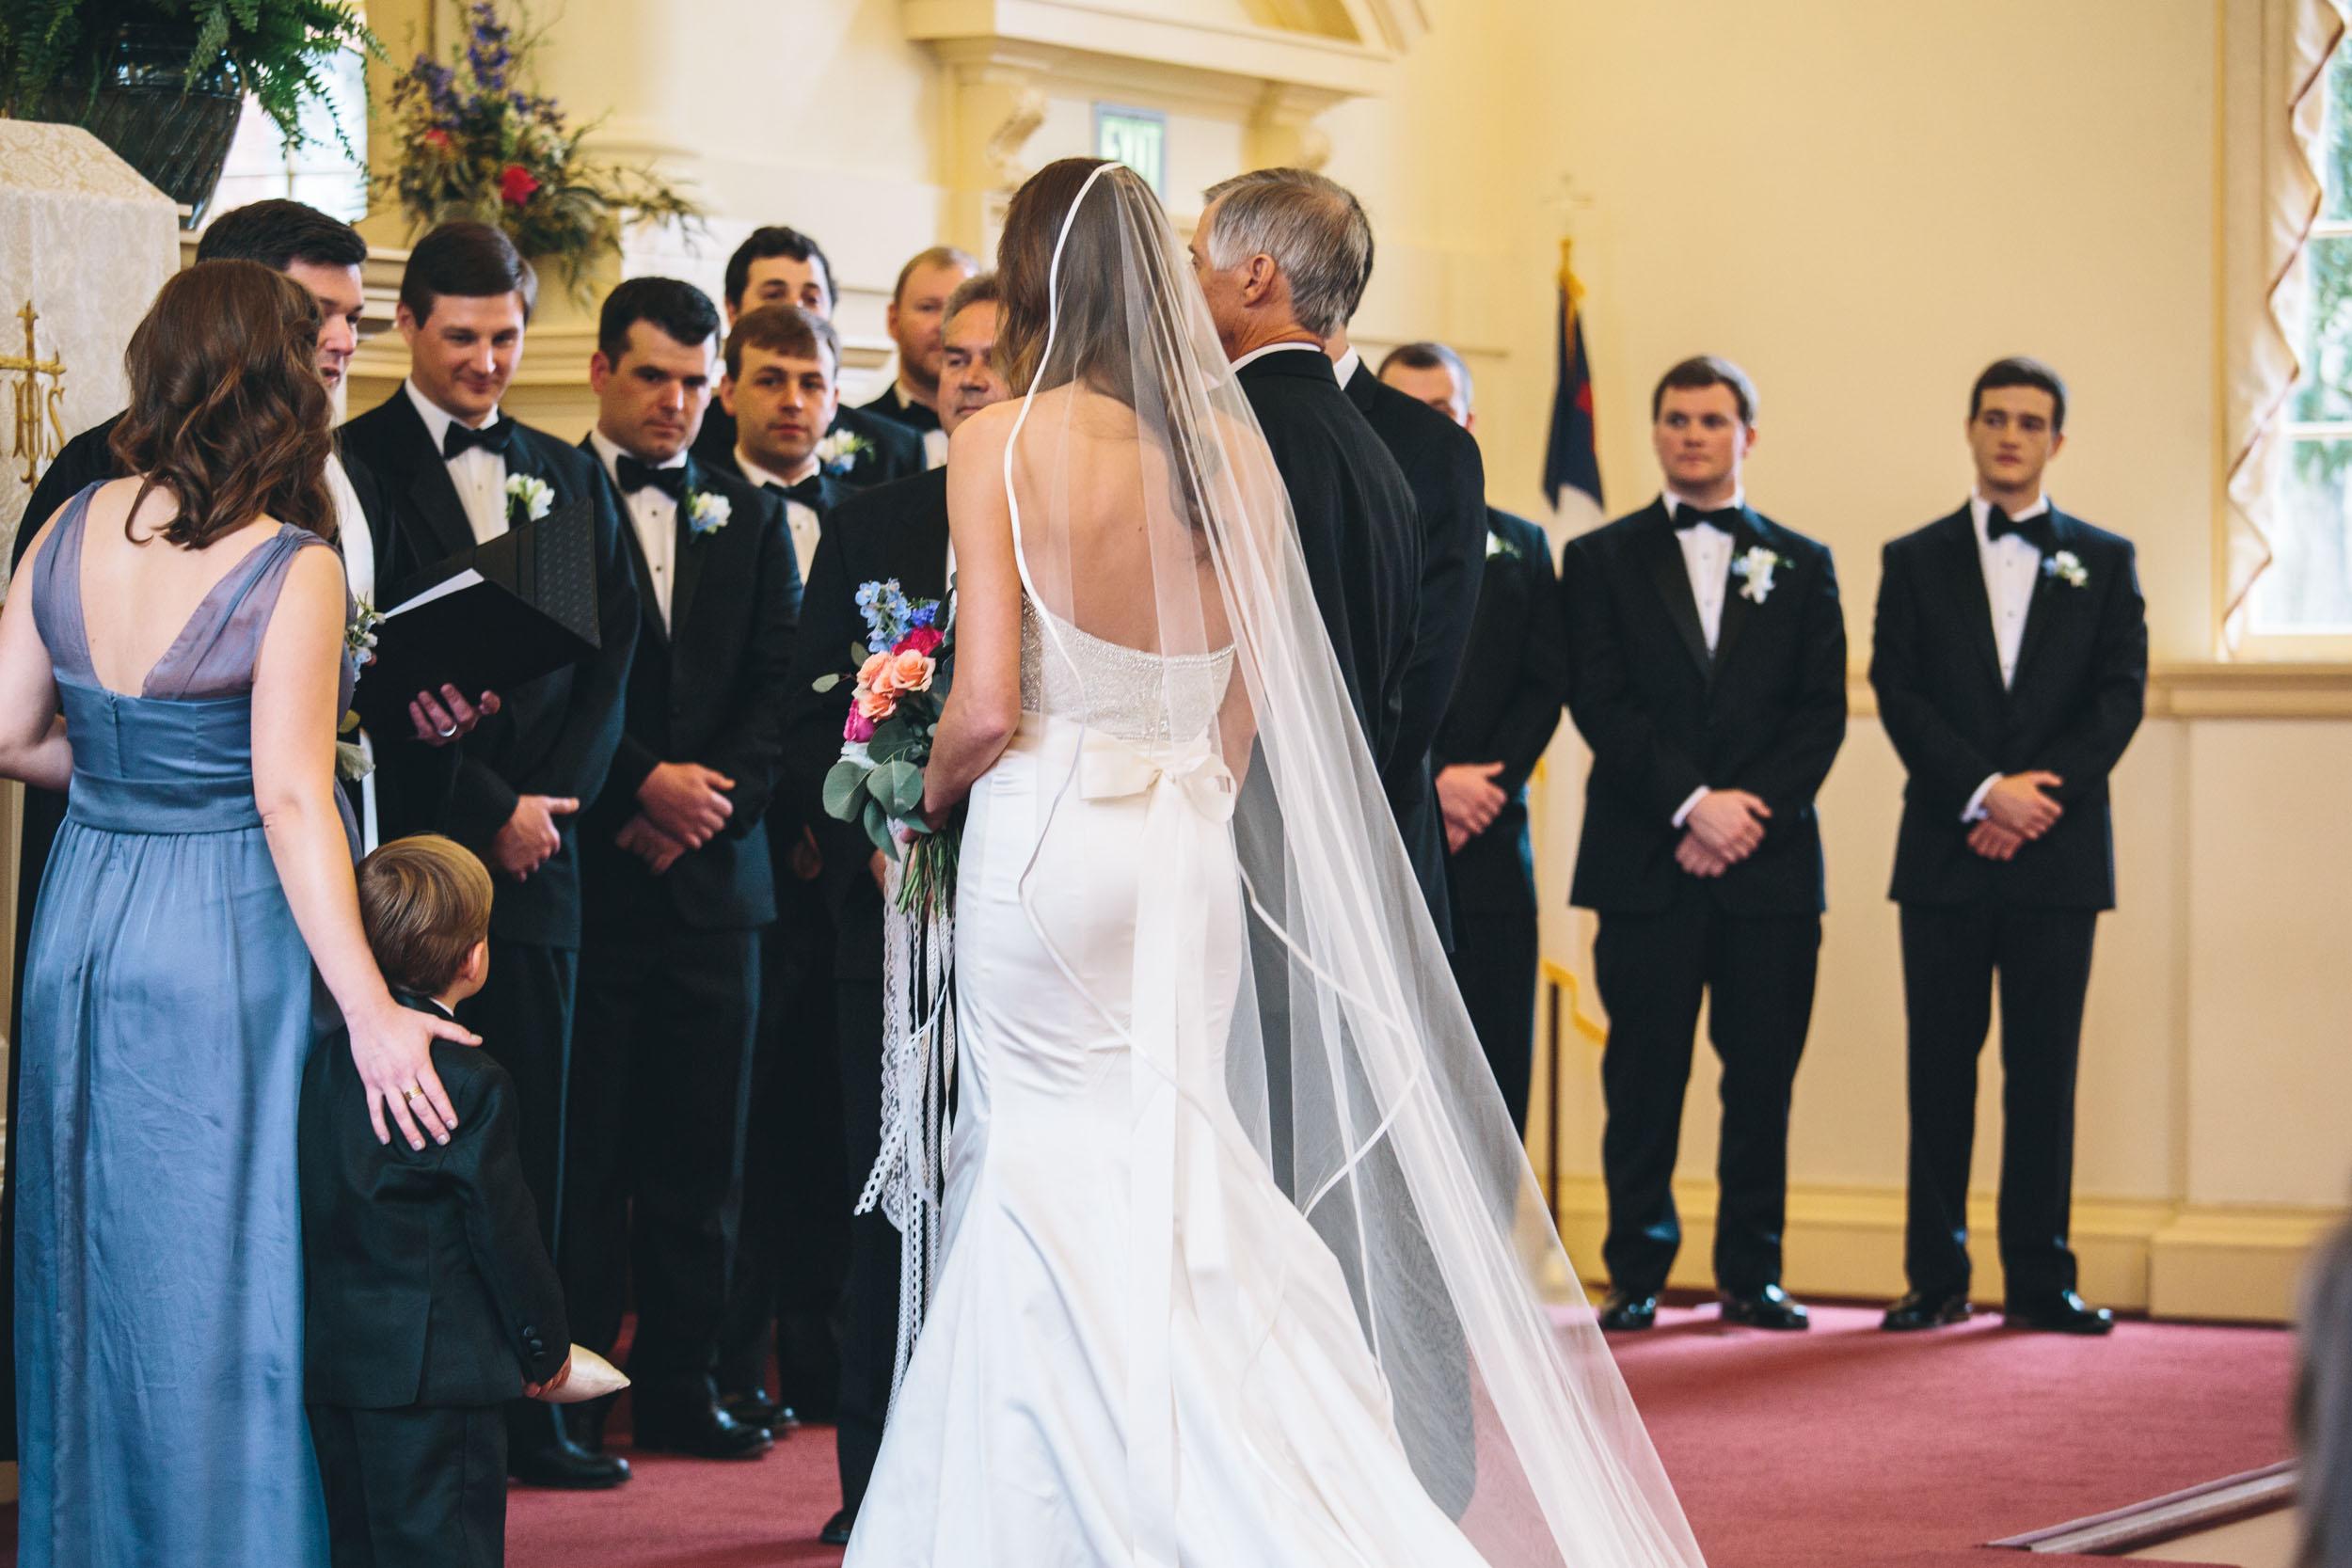 jimmy-rowalt-atlanta-wedding-photography-075.jpg